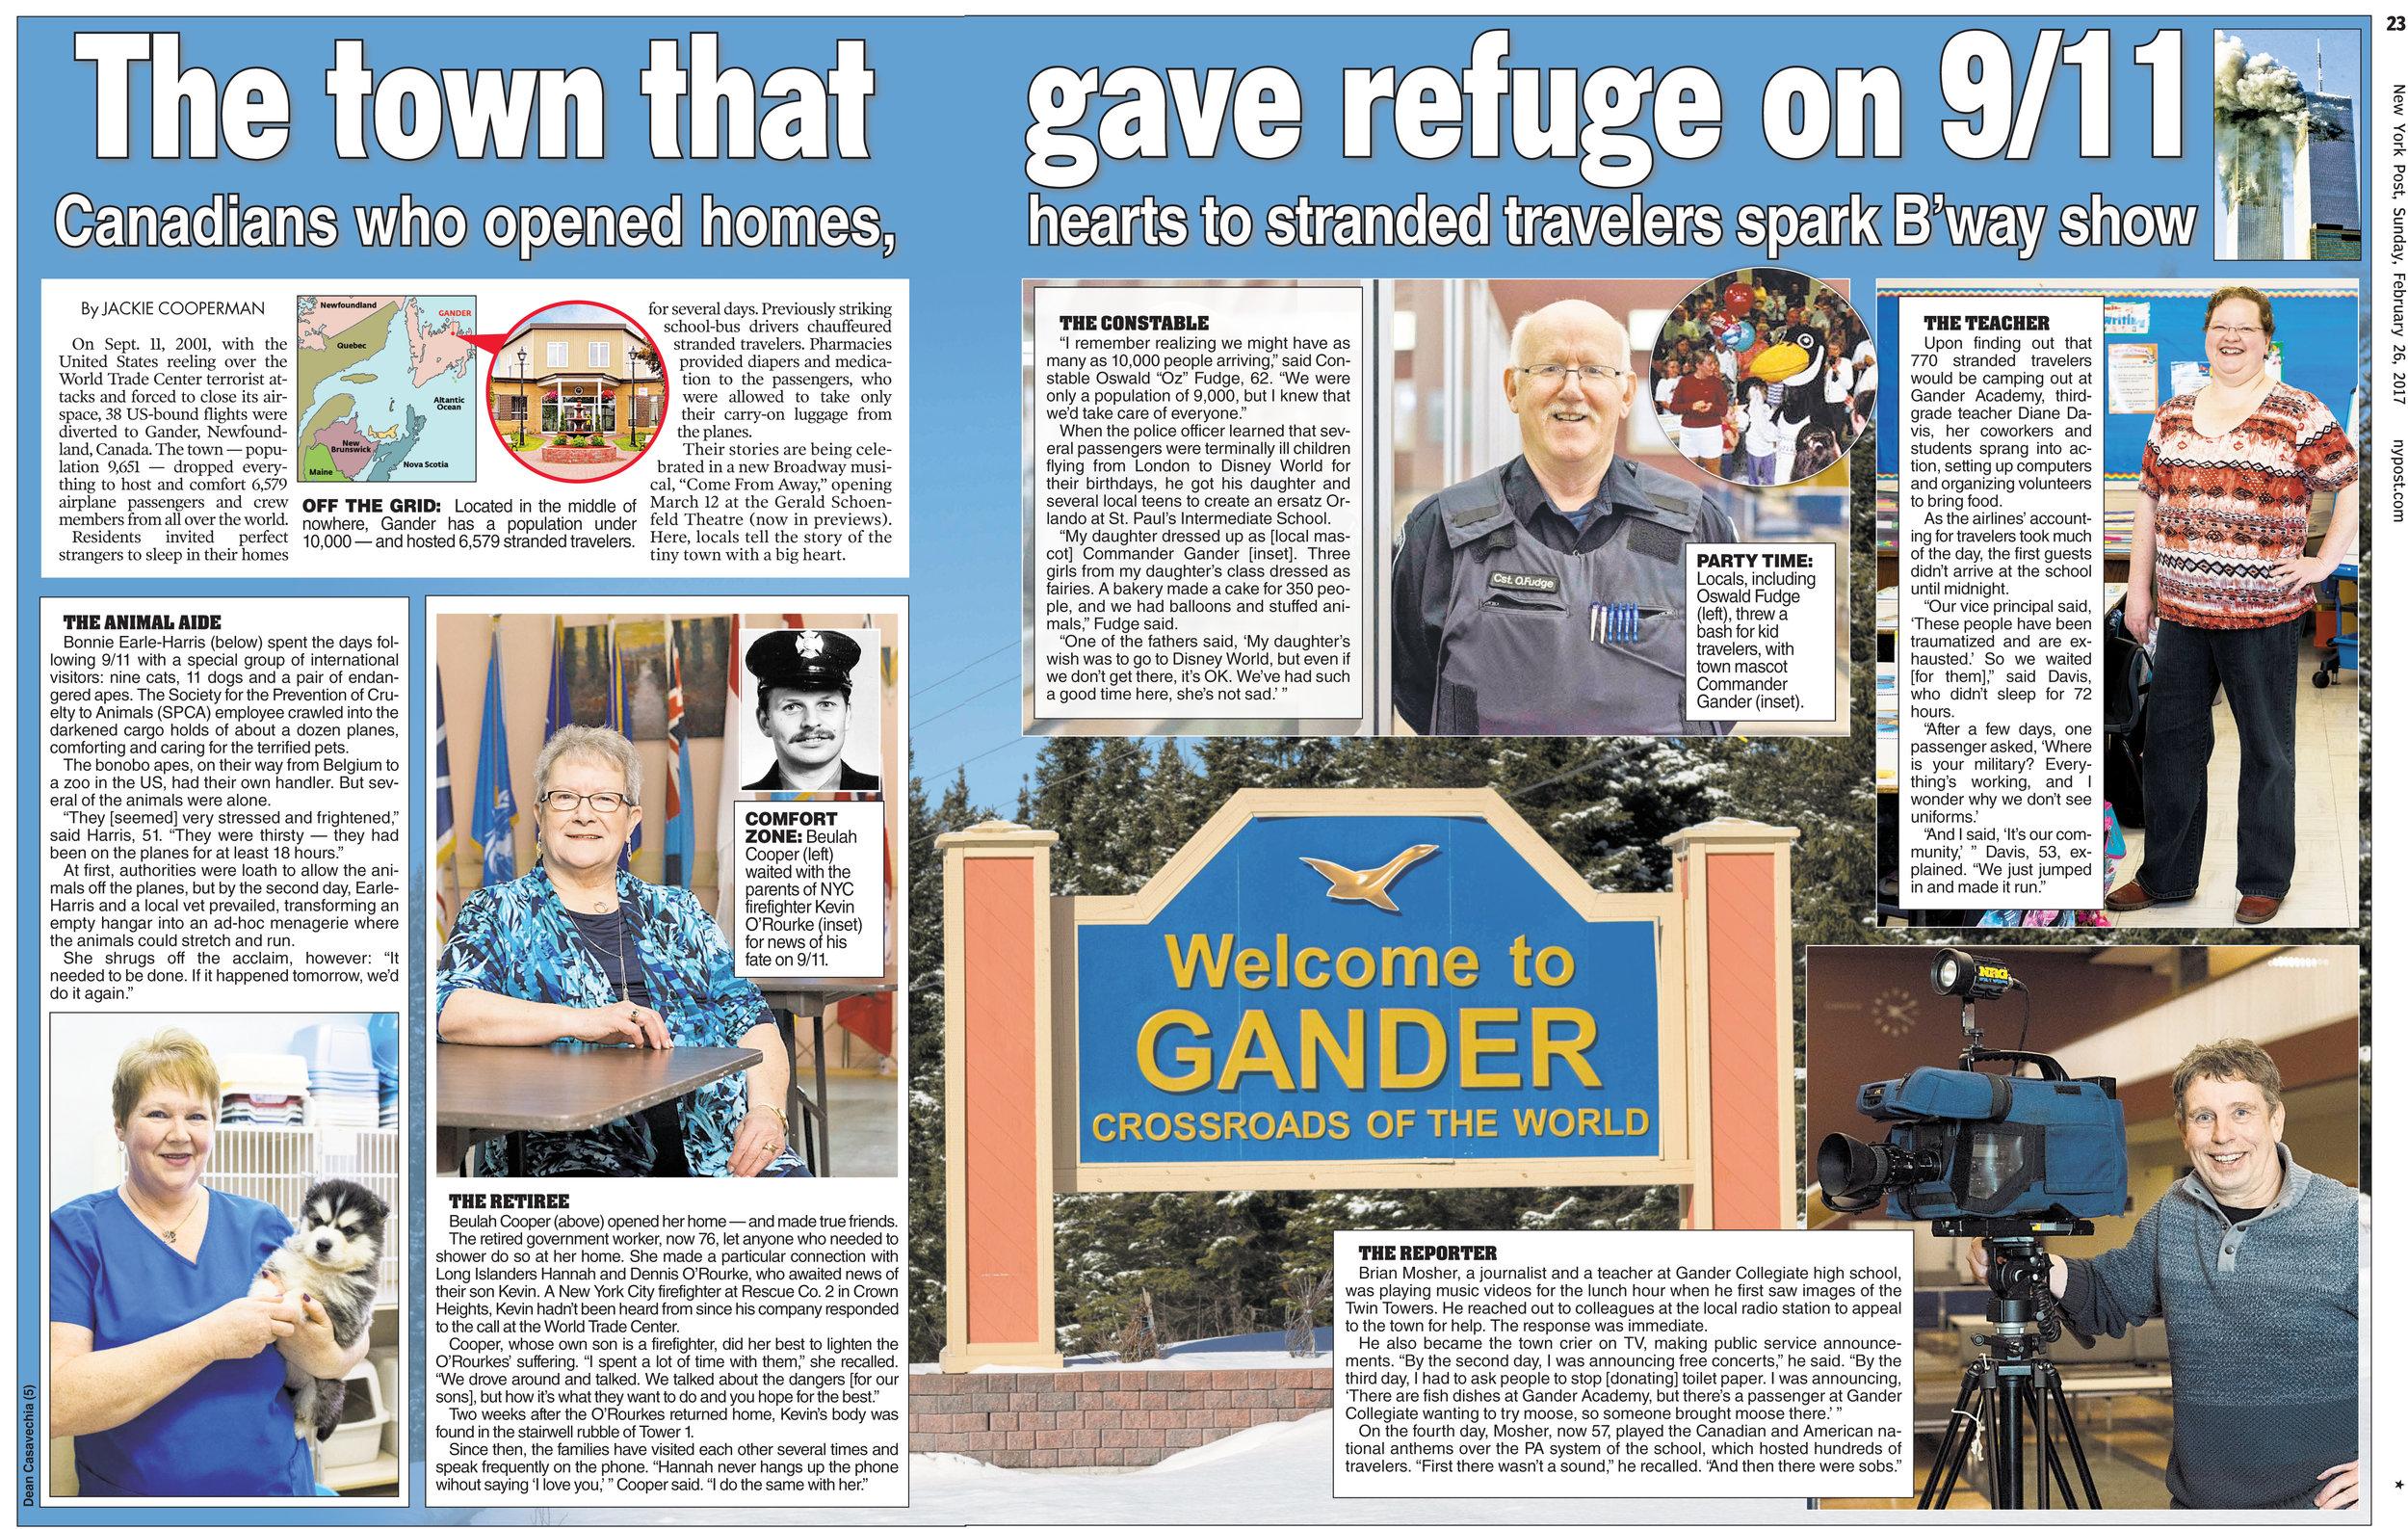 The Town of Gander, Newfoundland